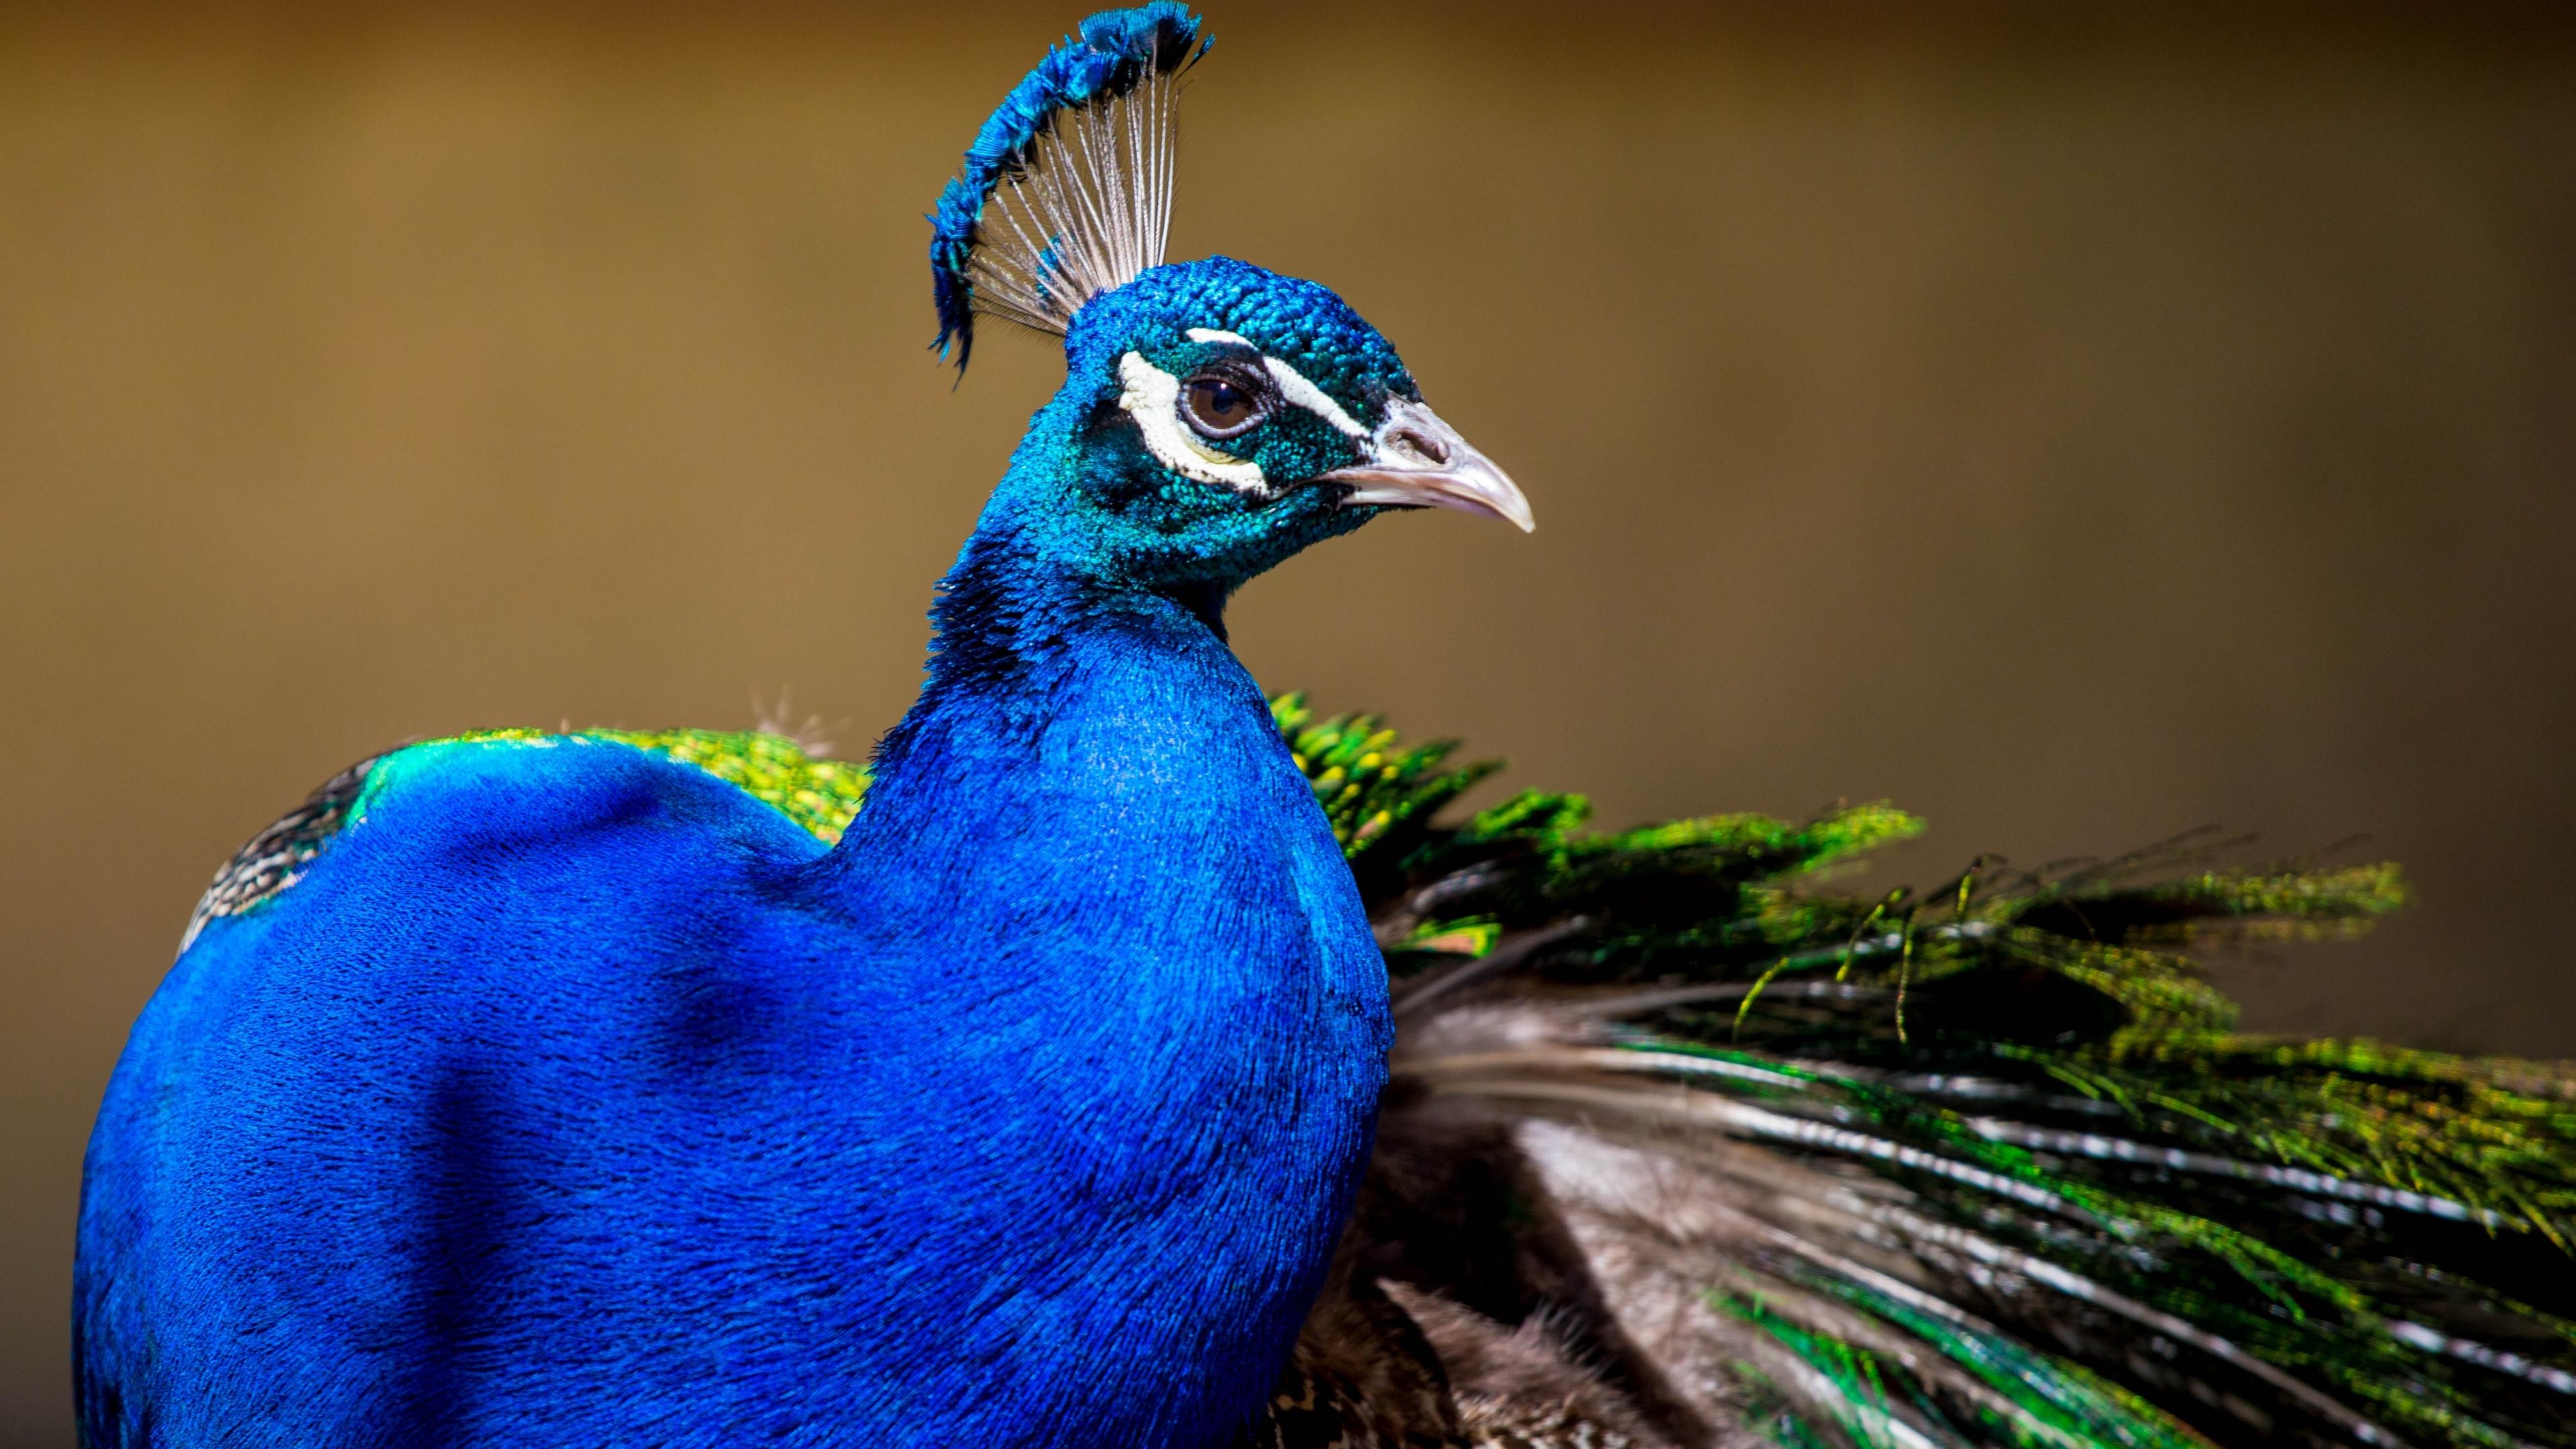 Peacock, colorful bird, plumage, 3840x2160 wallpaper